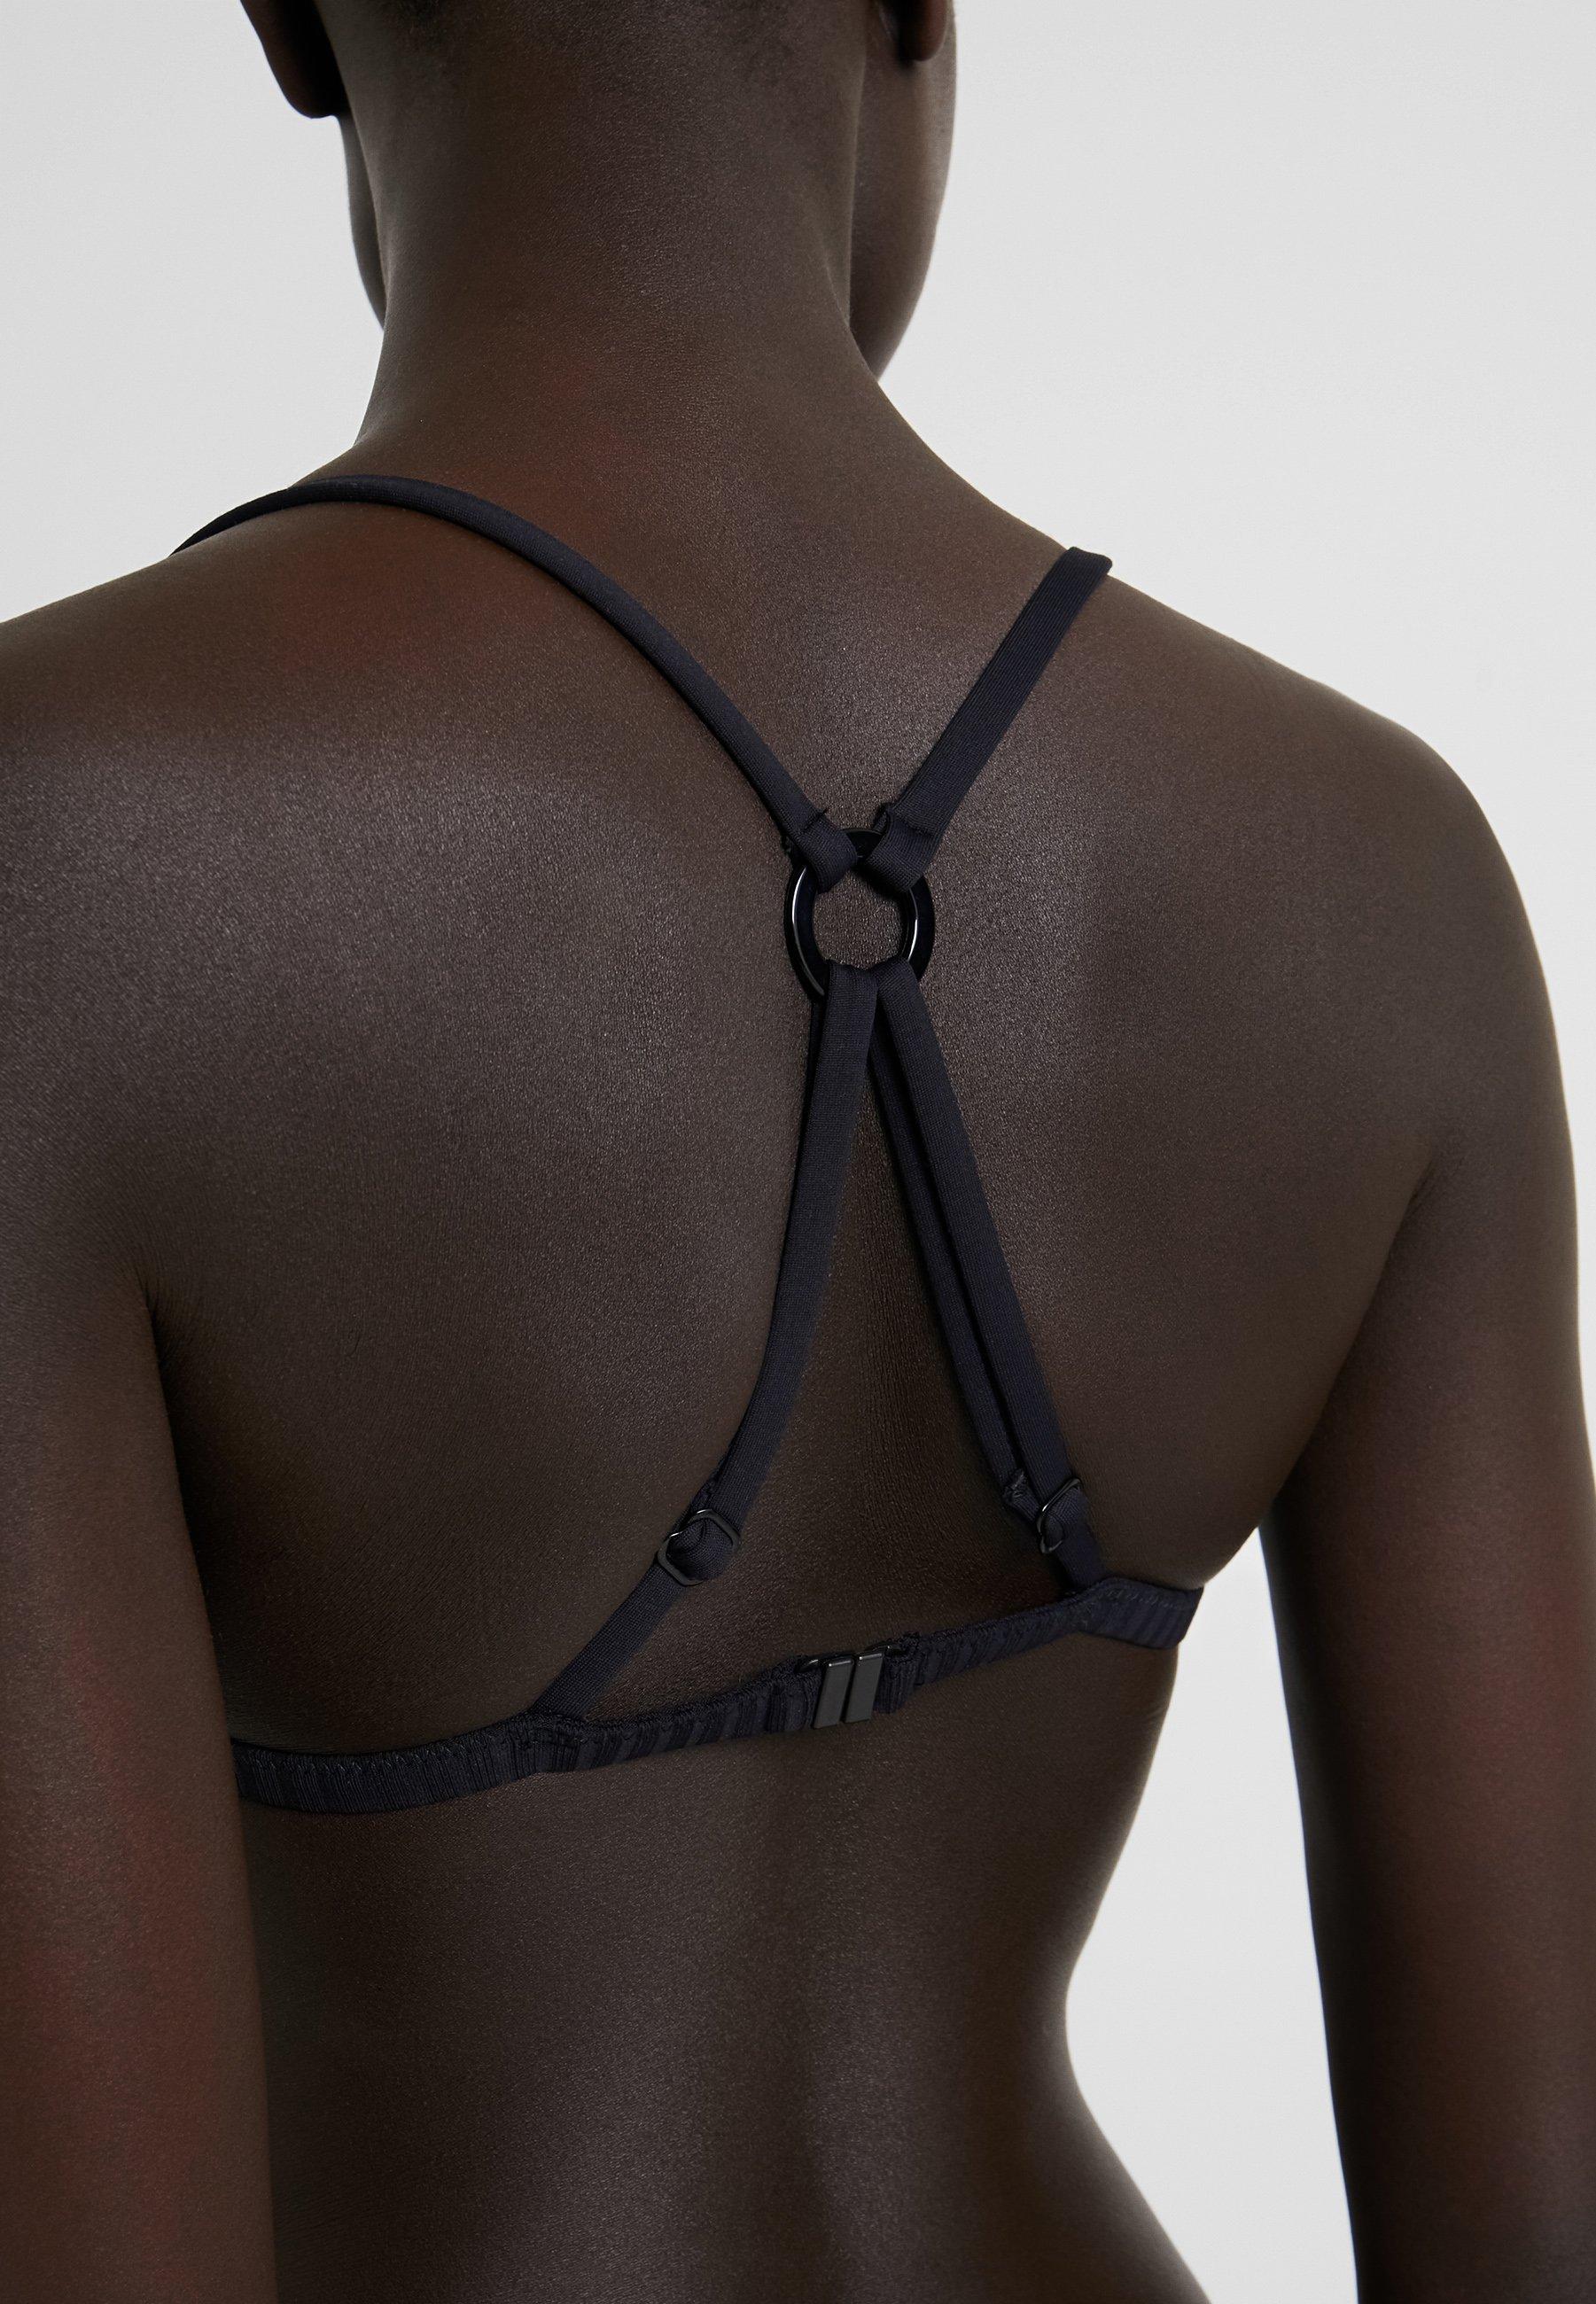 oliver SetBikini SetBikini oliver Black S S S Triangel Triangel Black oliver nwvmN80